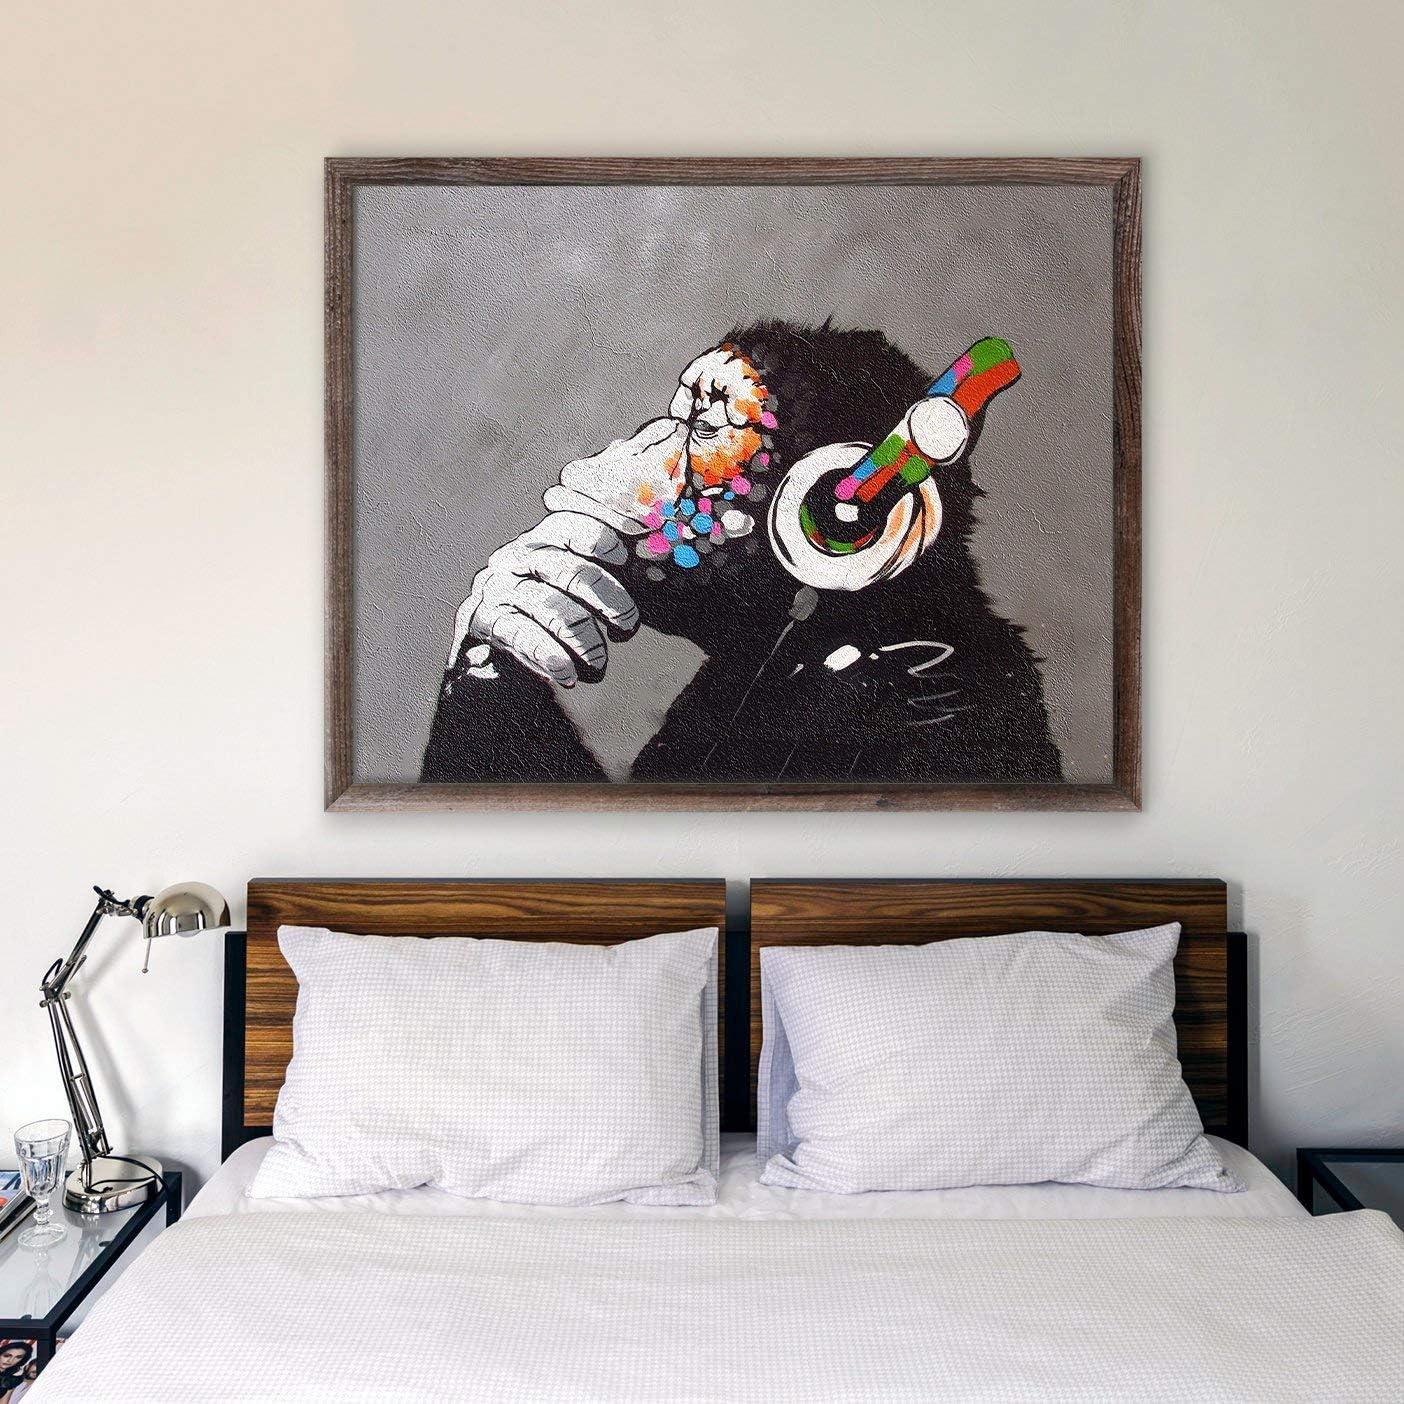 Banksy Monkey Headphones Graffiti 3d Smashed Wall Sticker Poster Bedroom Z699